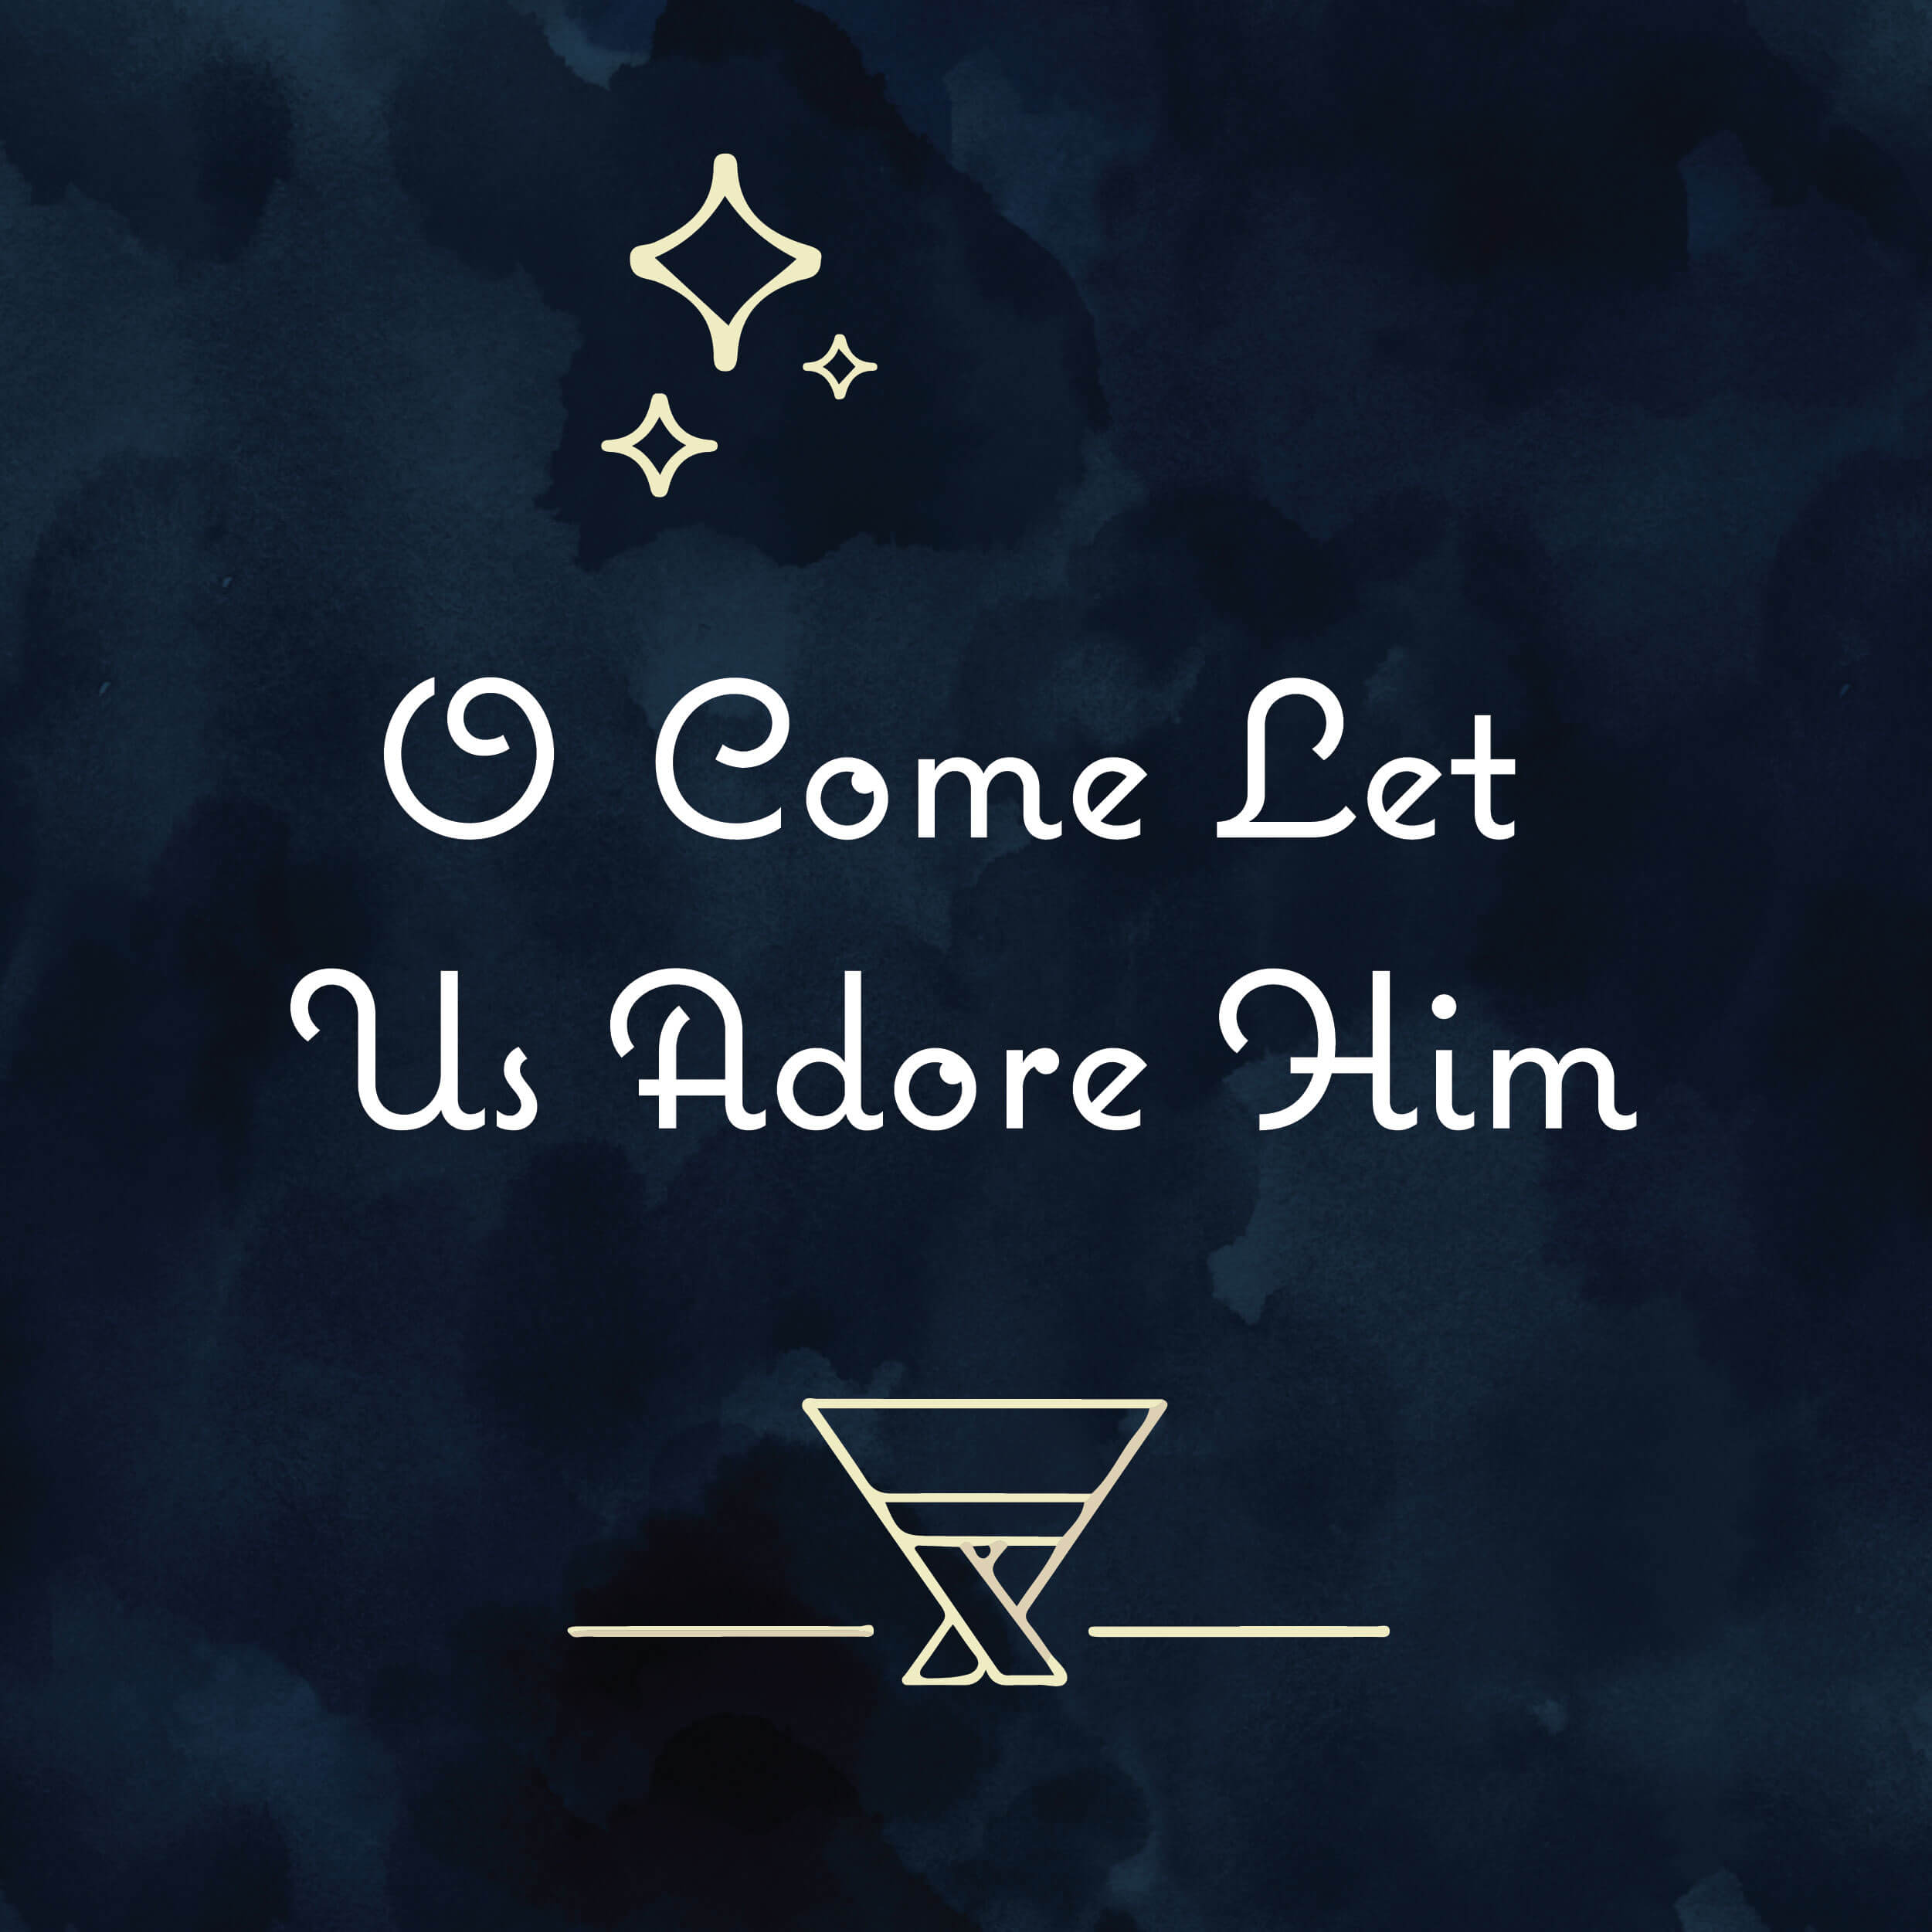 O Come Let Us Adore Him: O come all ye faithful